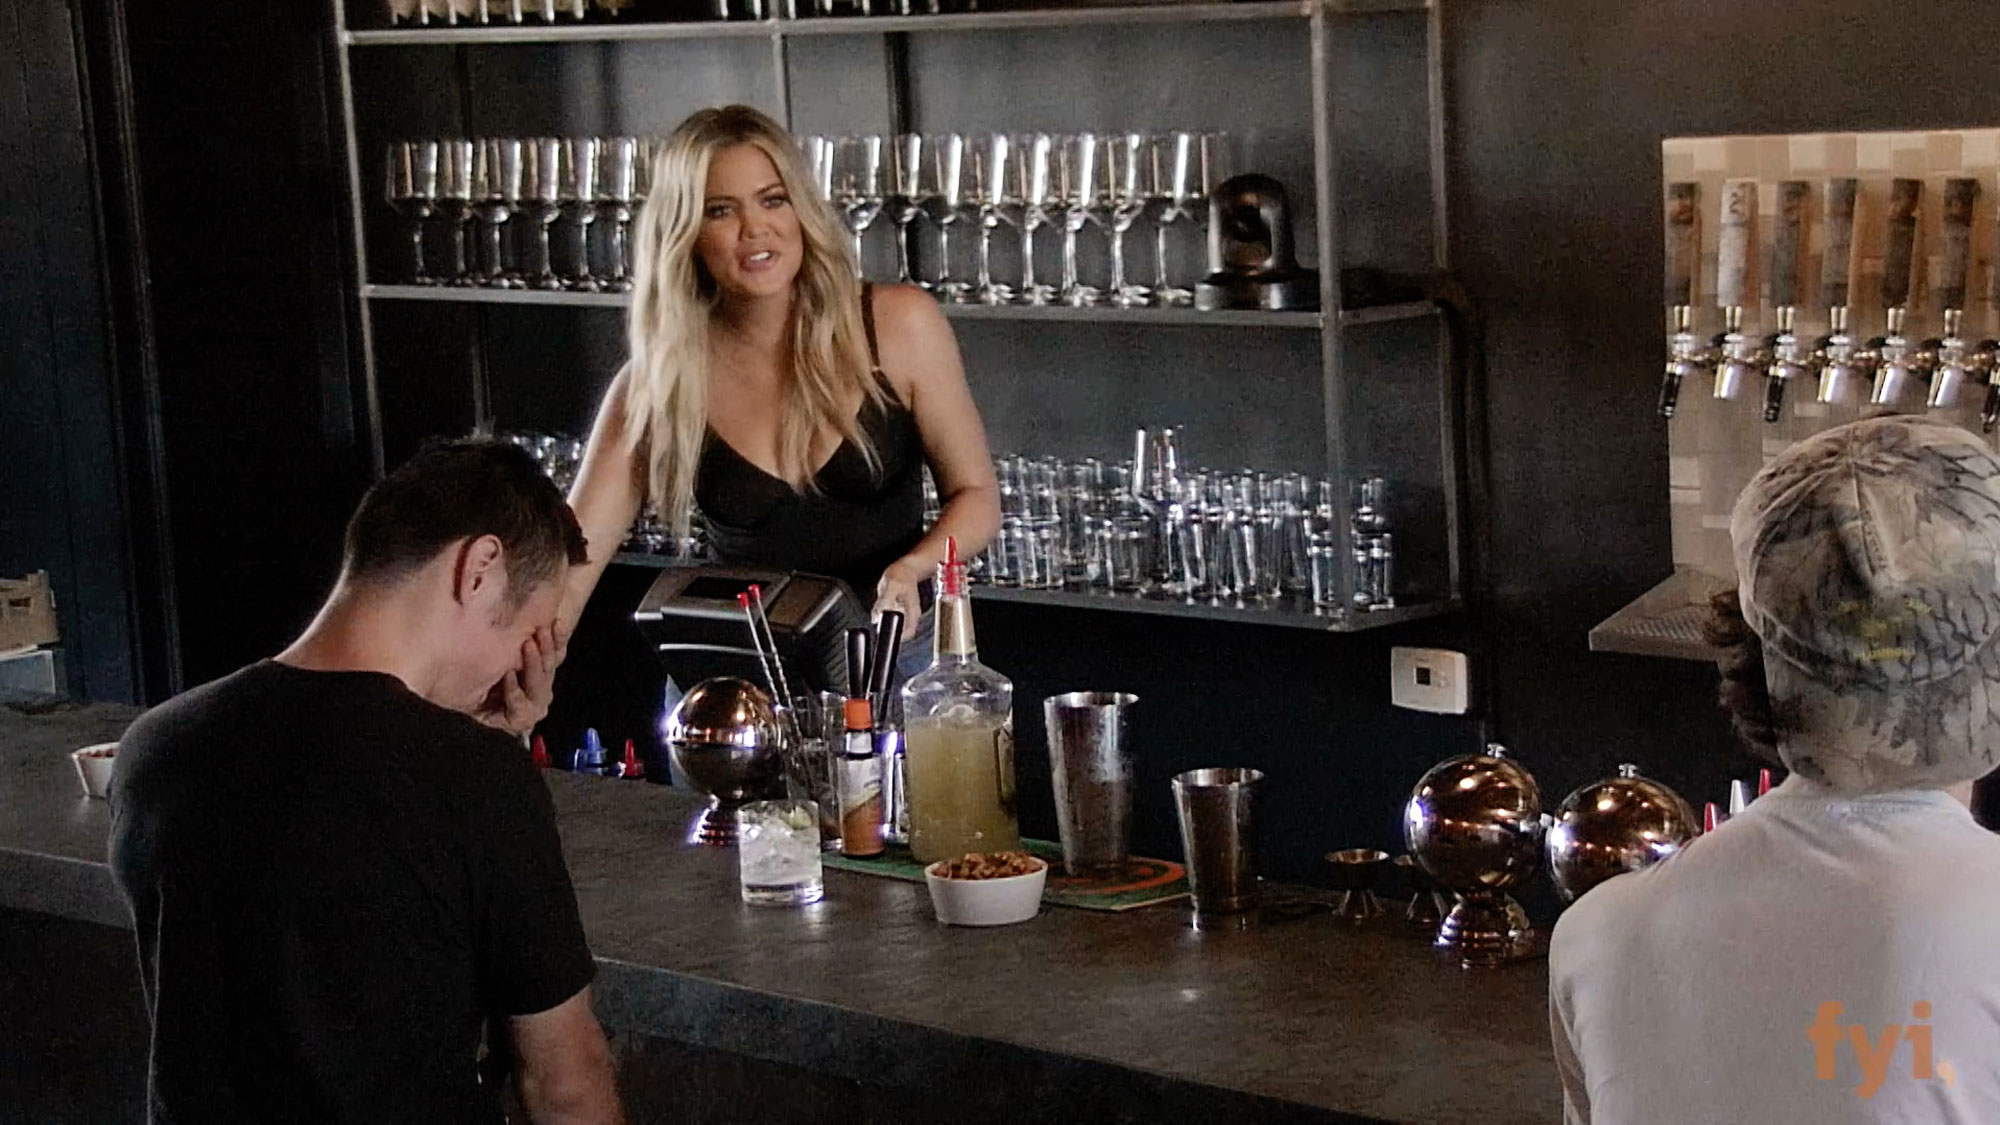 Khloé Kardashian Serves Up a Few Kocktails